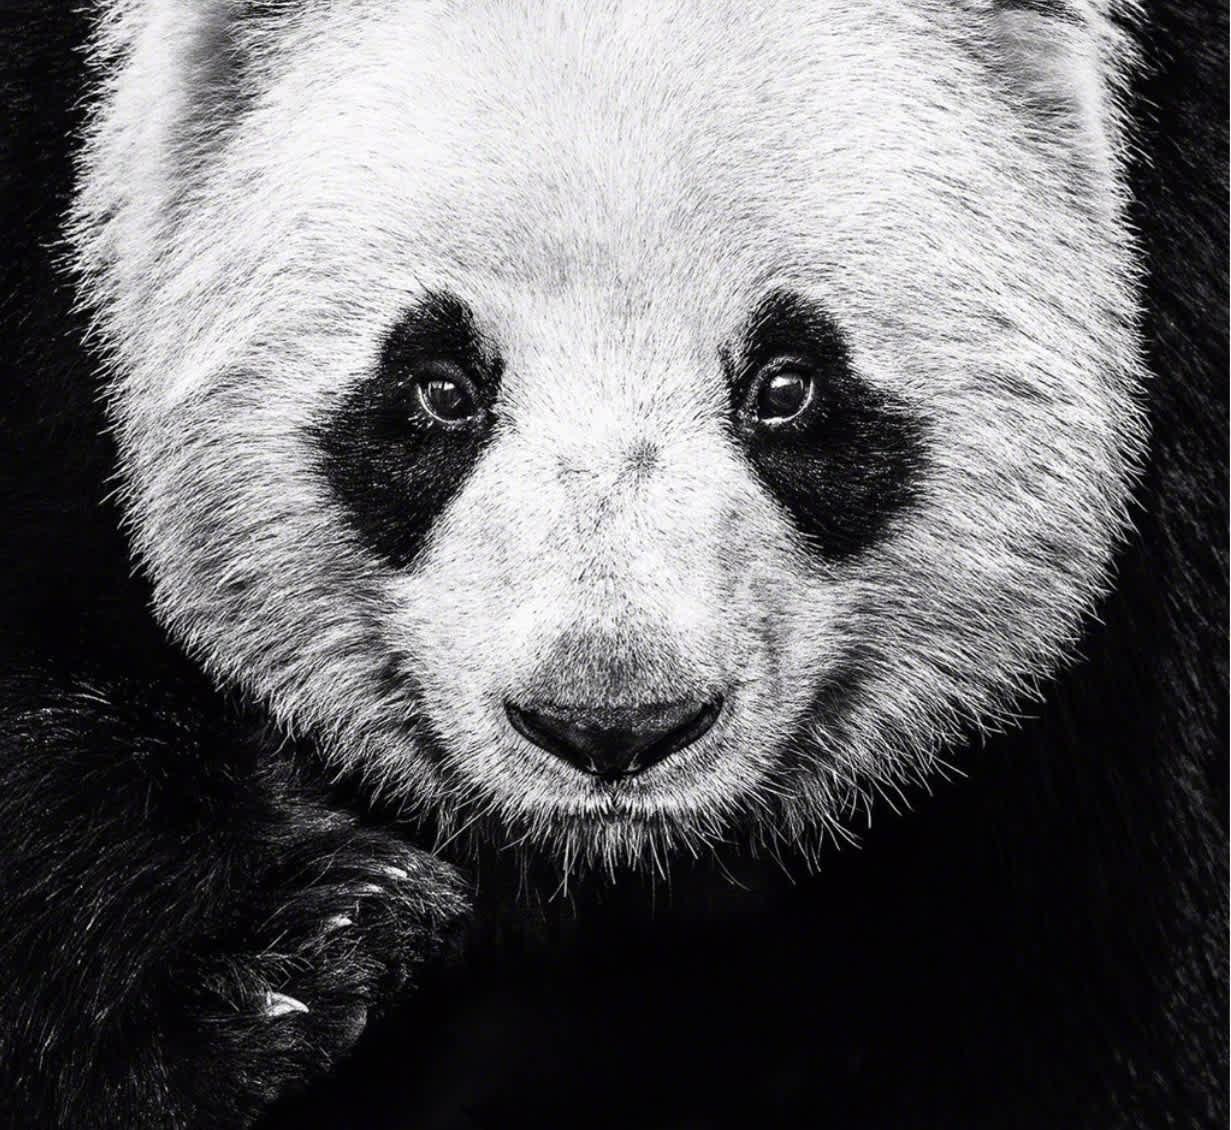 David Yarrow, Kung Fu Panda, 2016